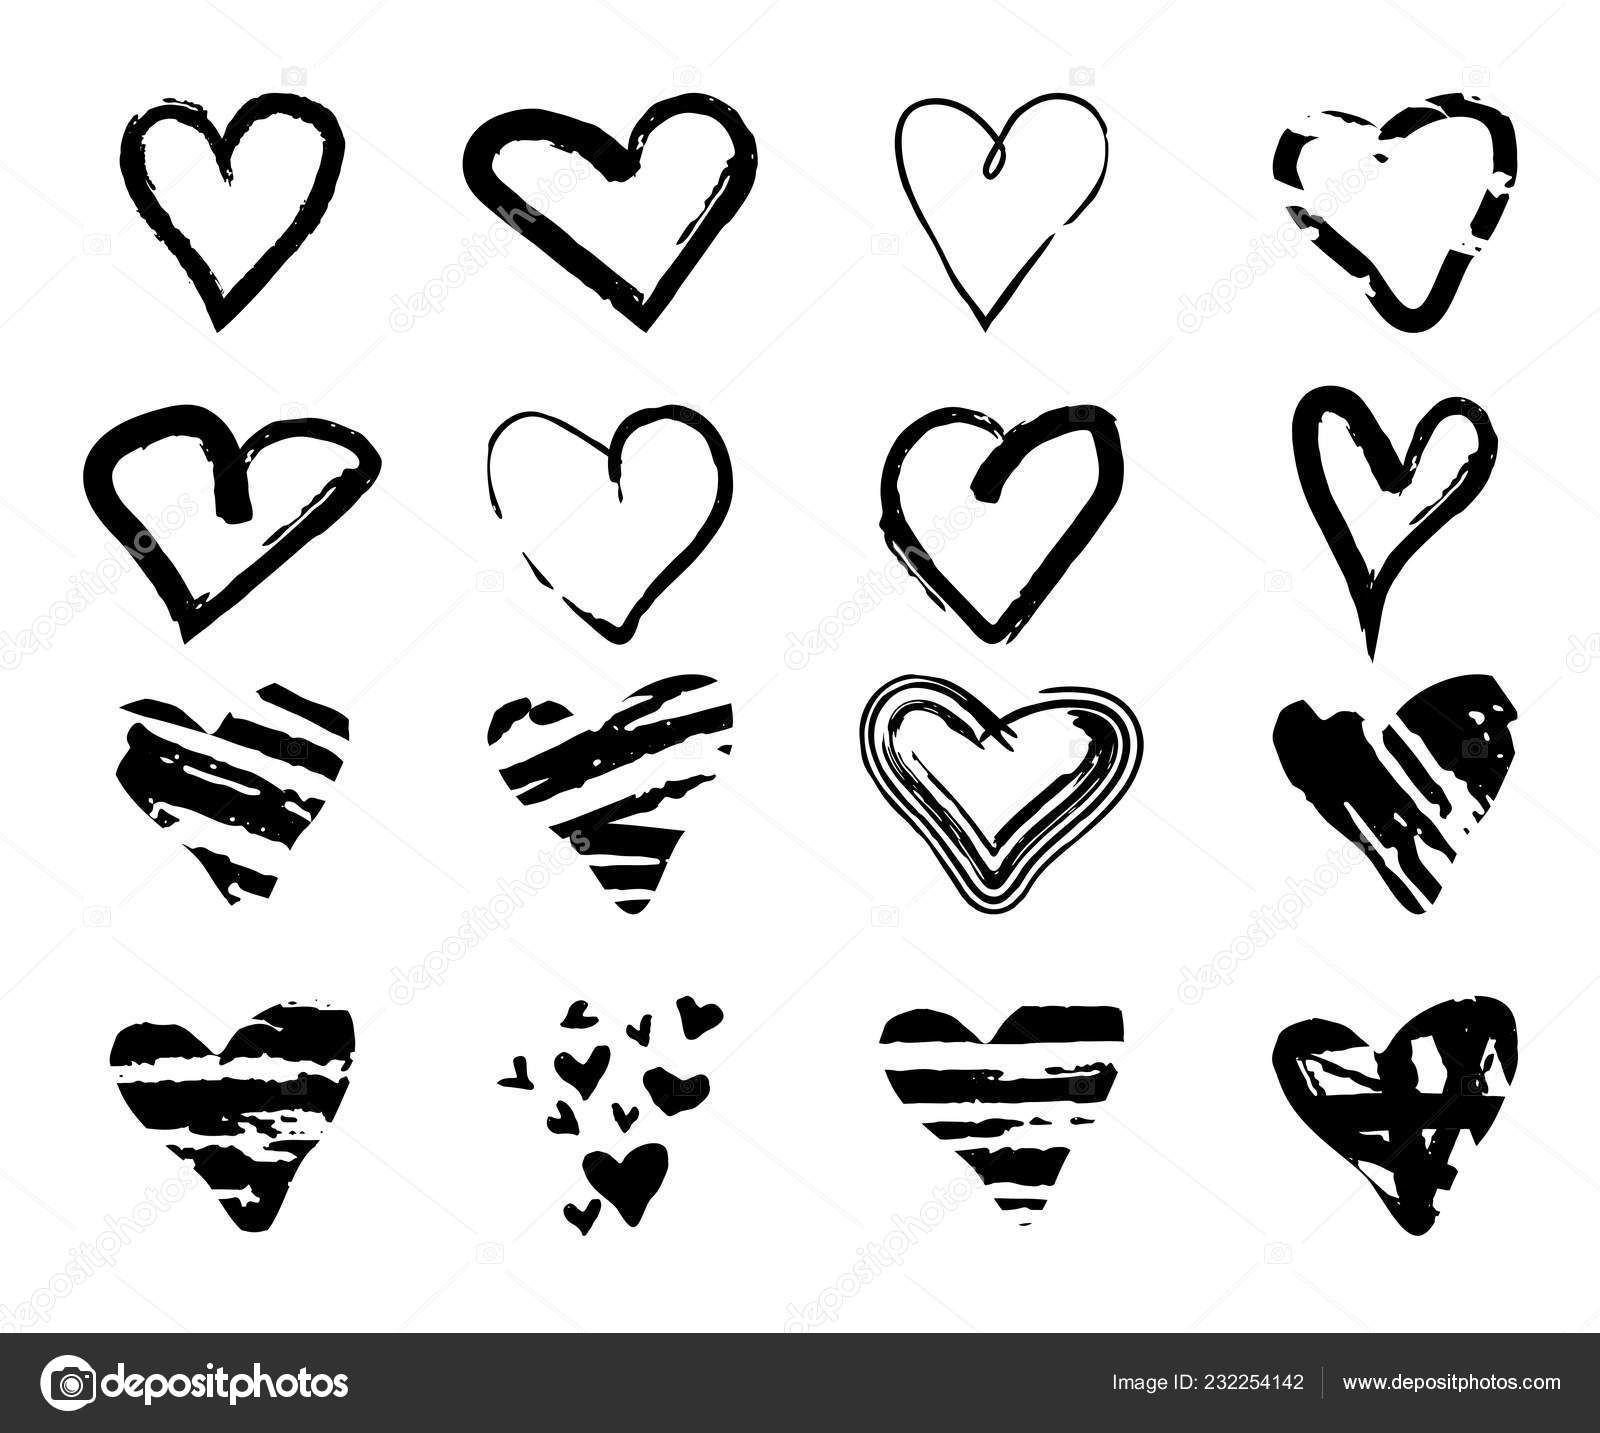 Sada Rucne Kreslenou Grunge Srdce Pro Pouziti Designu Cerny Skica